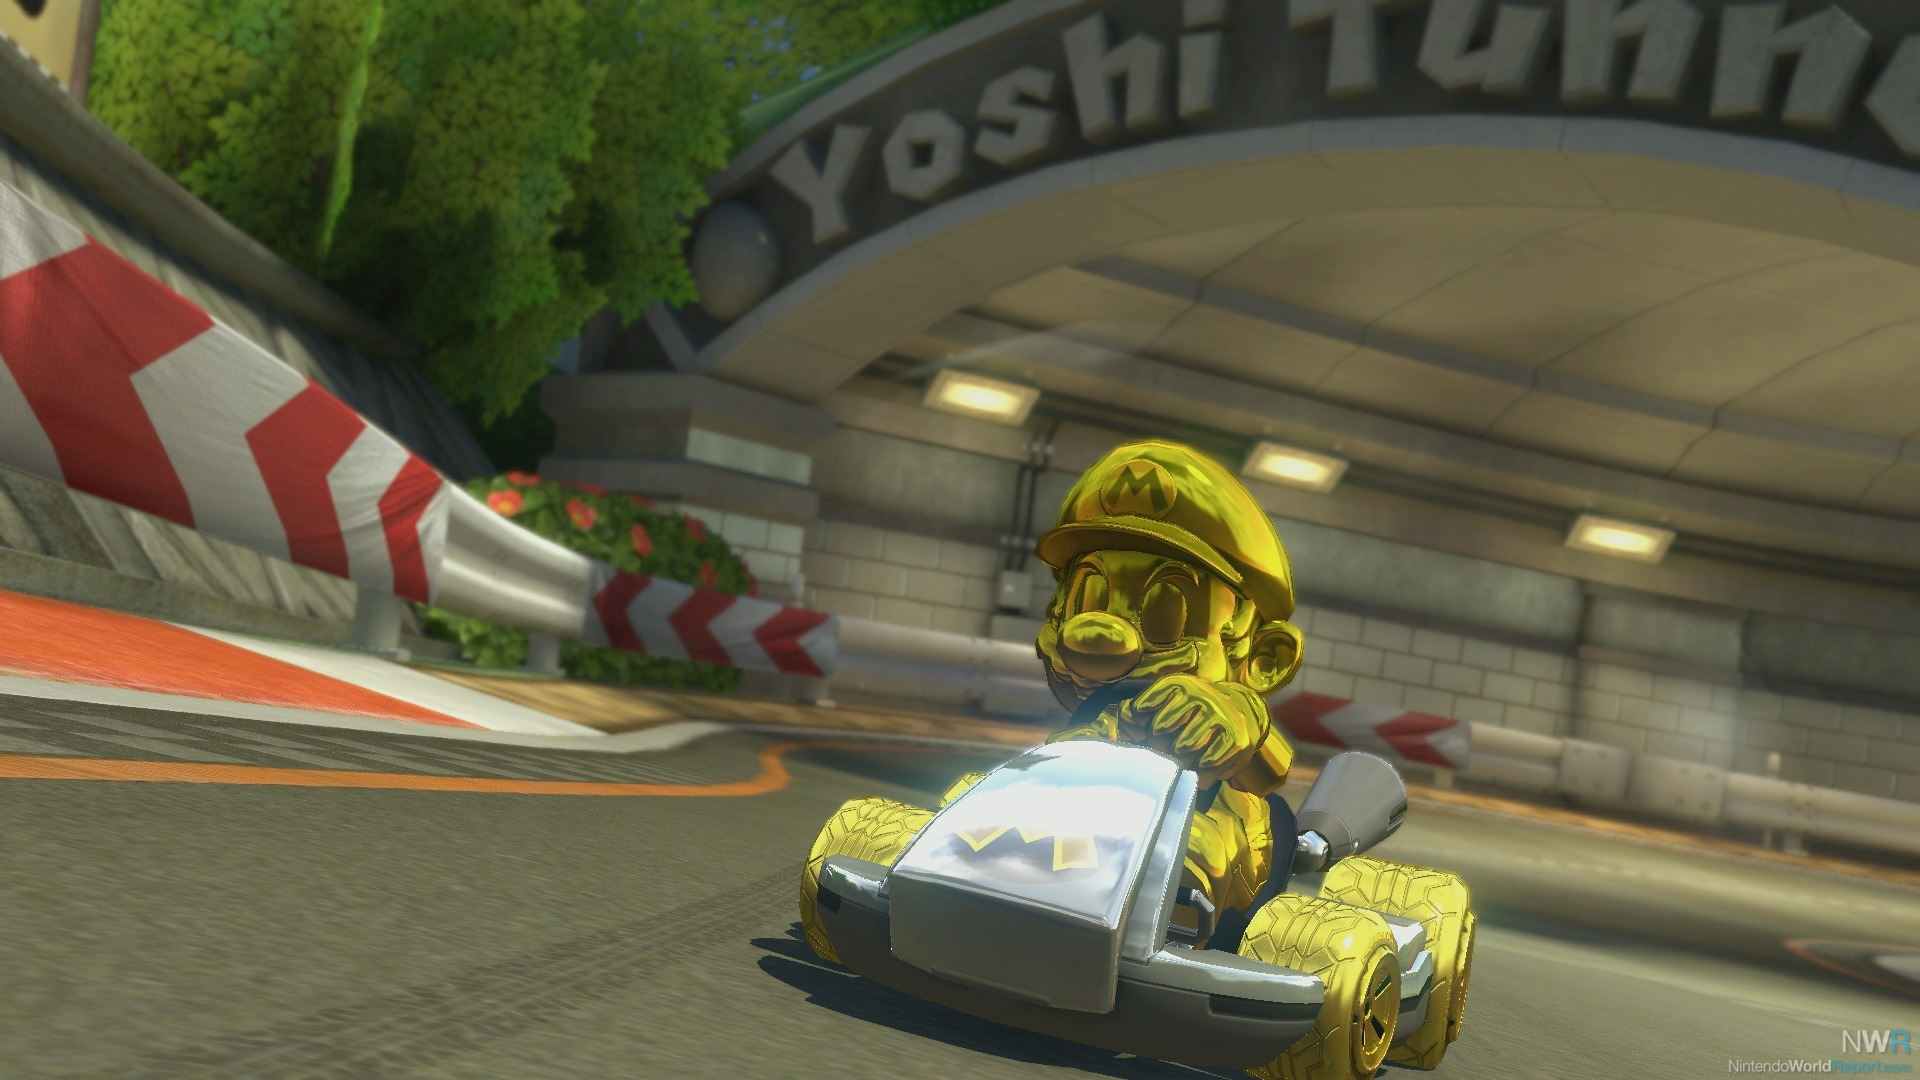 Mario Kart 8 Deluxe Sales #1 In UK, Over 450,000 In United States ...